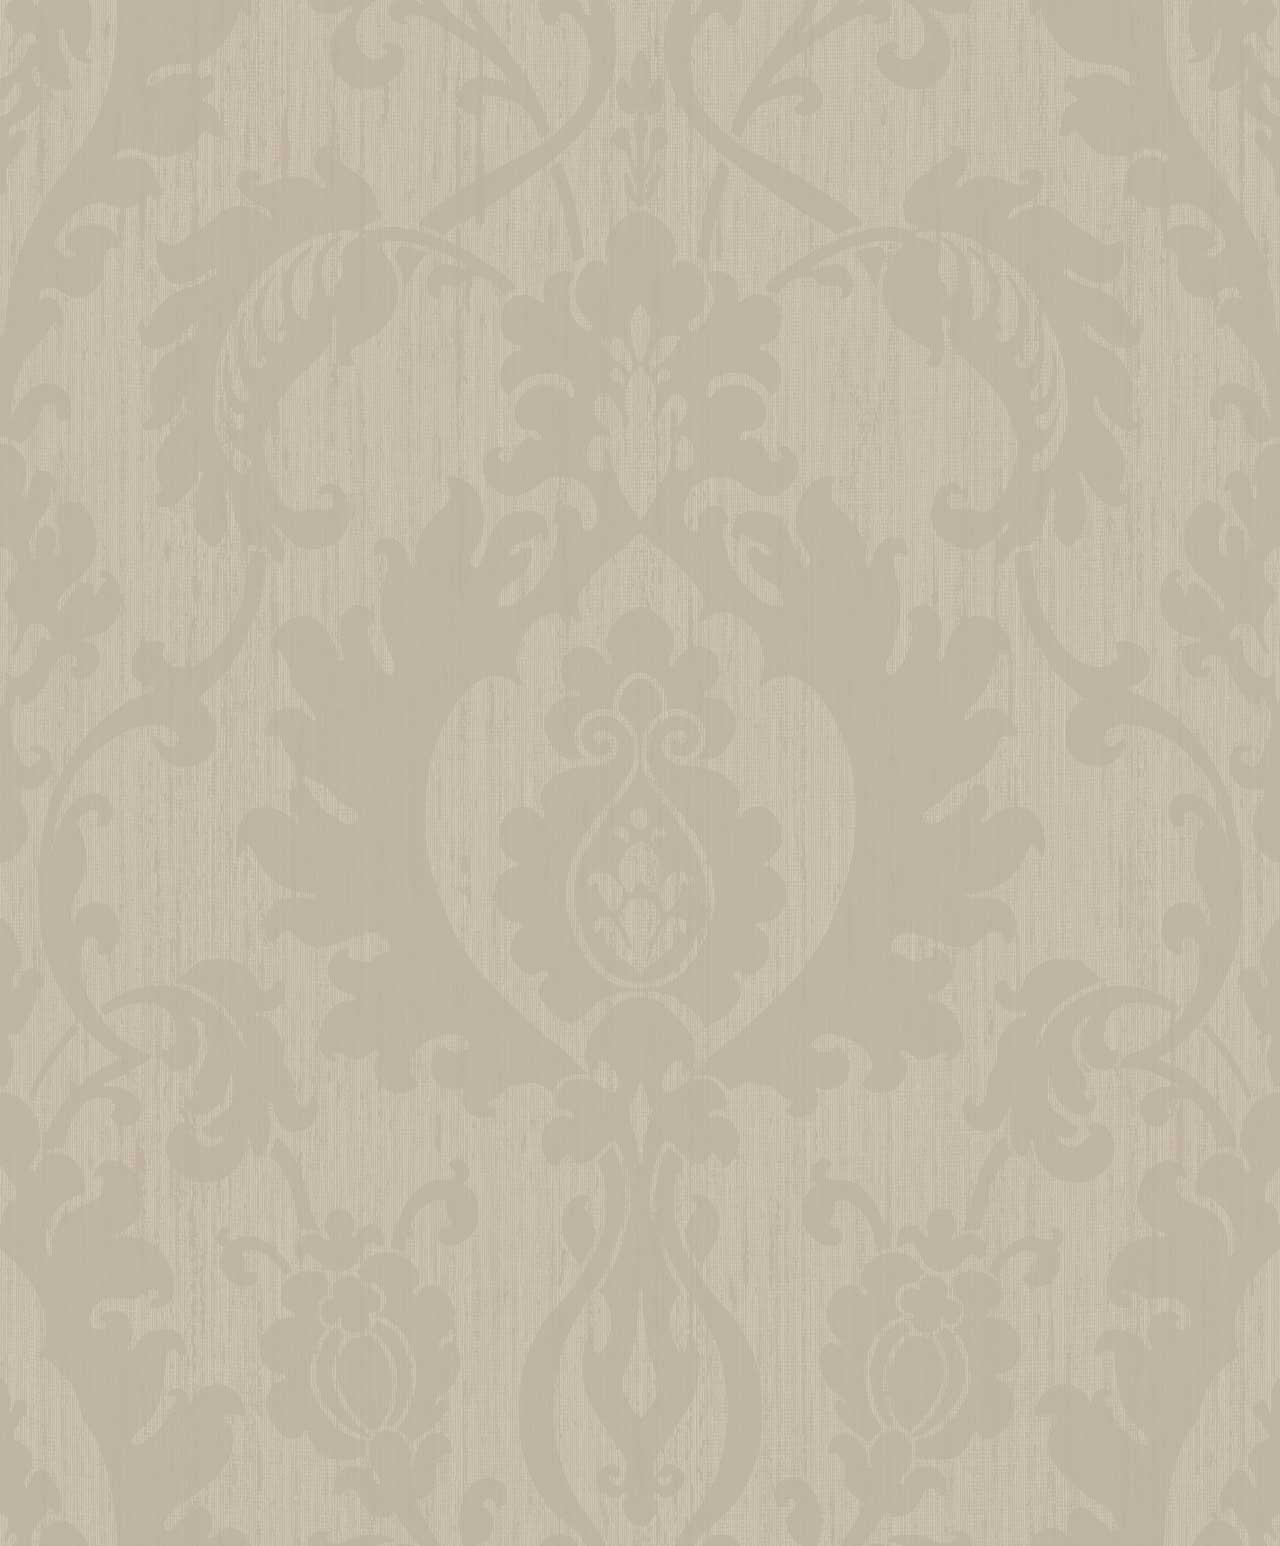 Sloan-Luxury-Wallpaper-SL00828-BOLD-DAMASK-BEADS